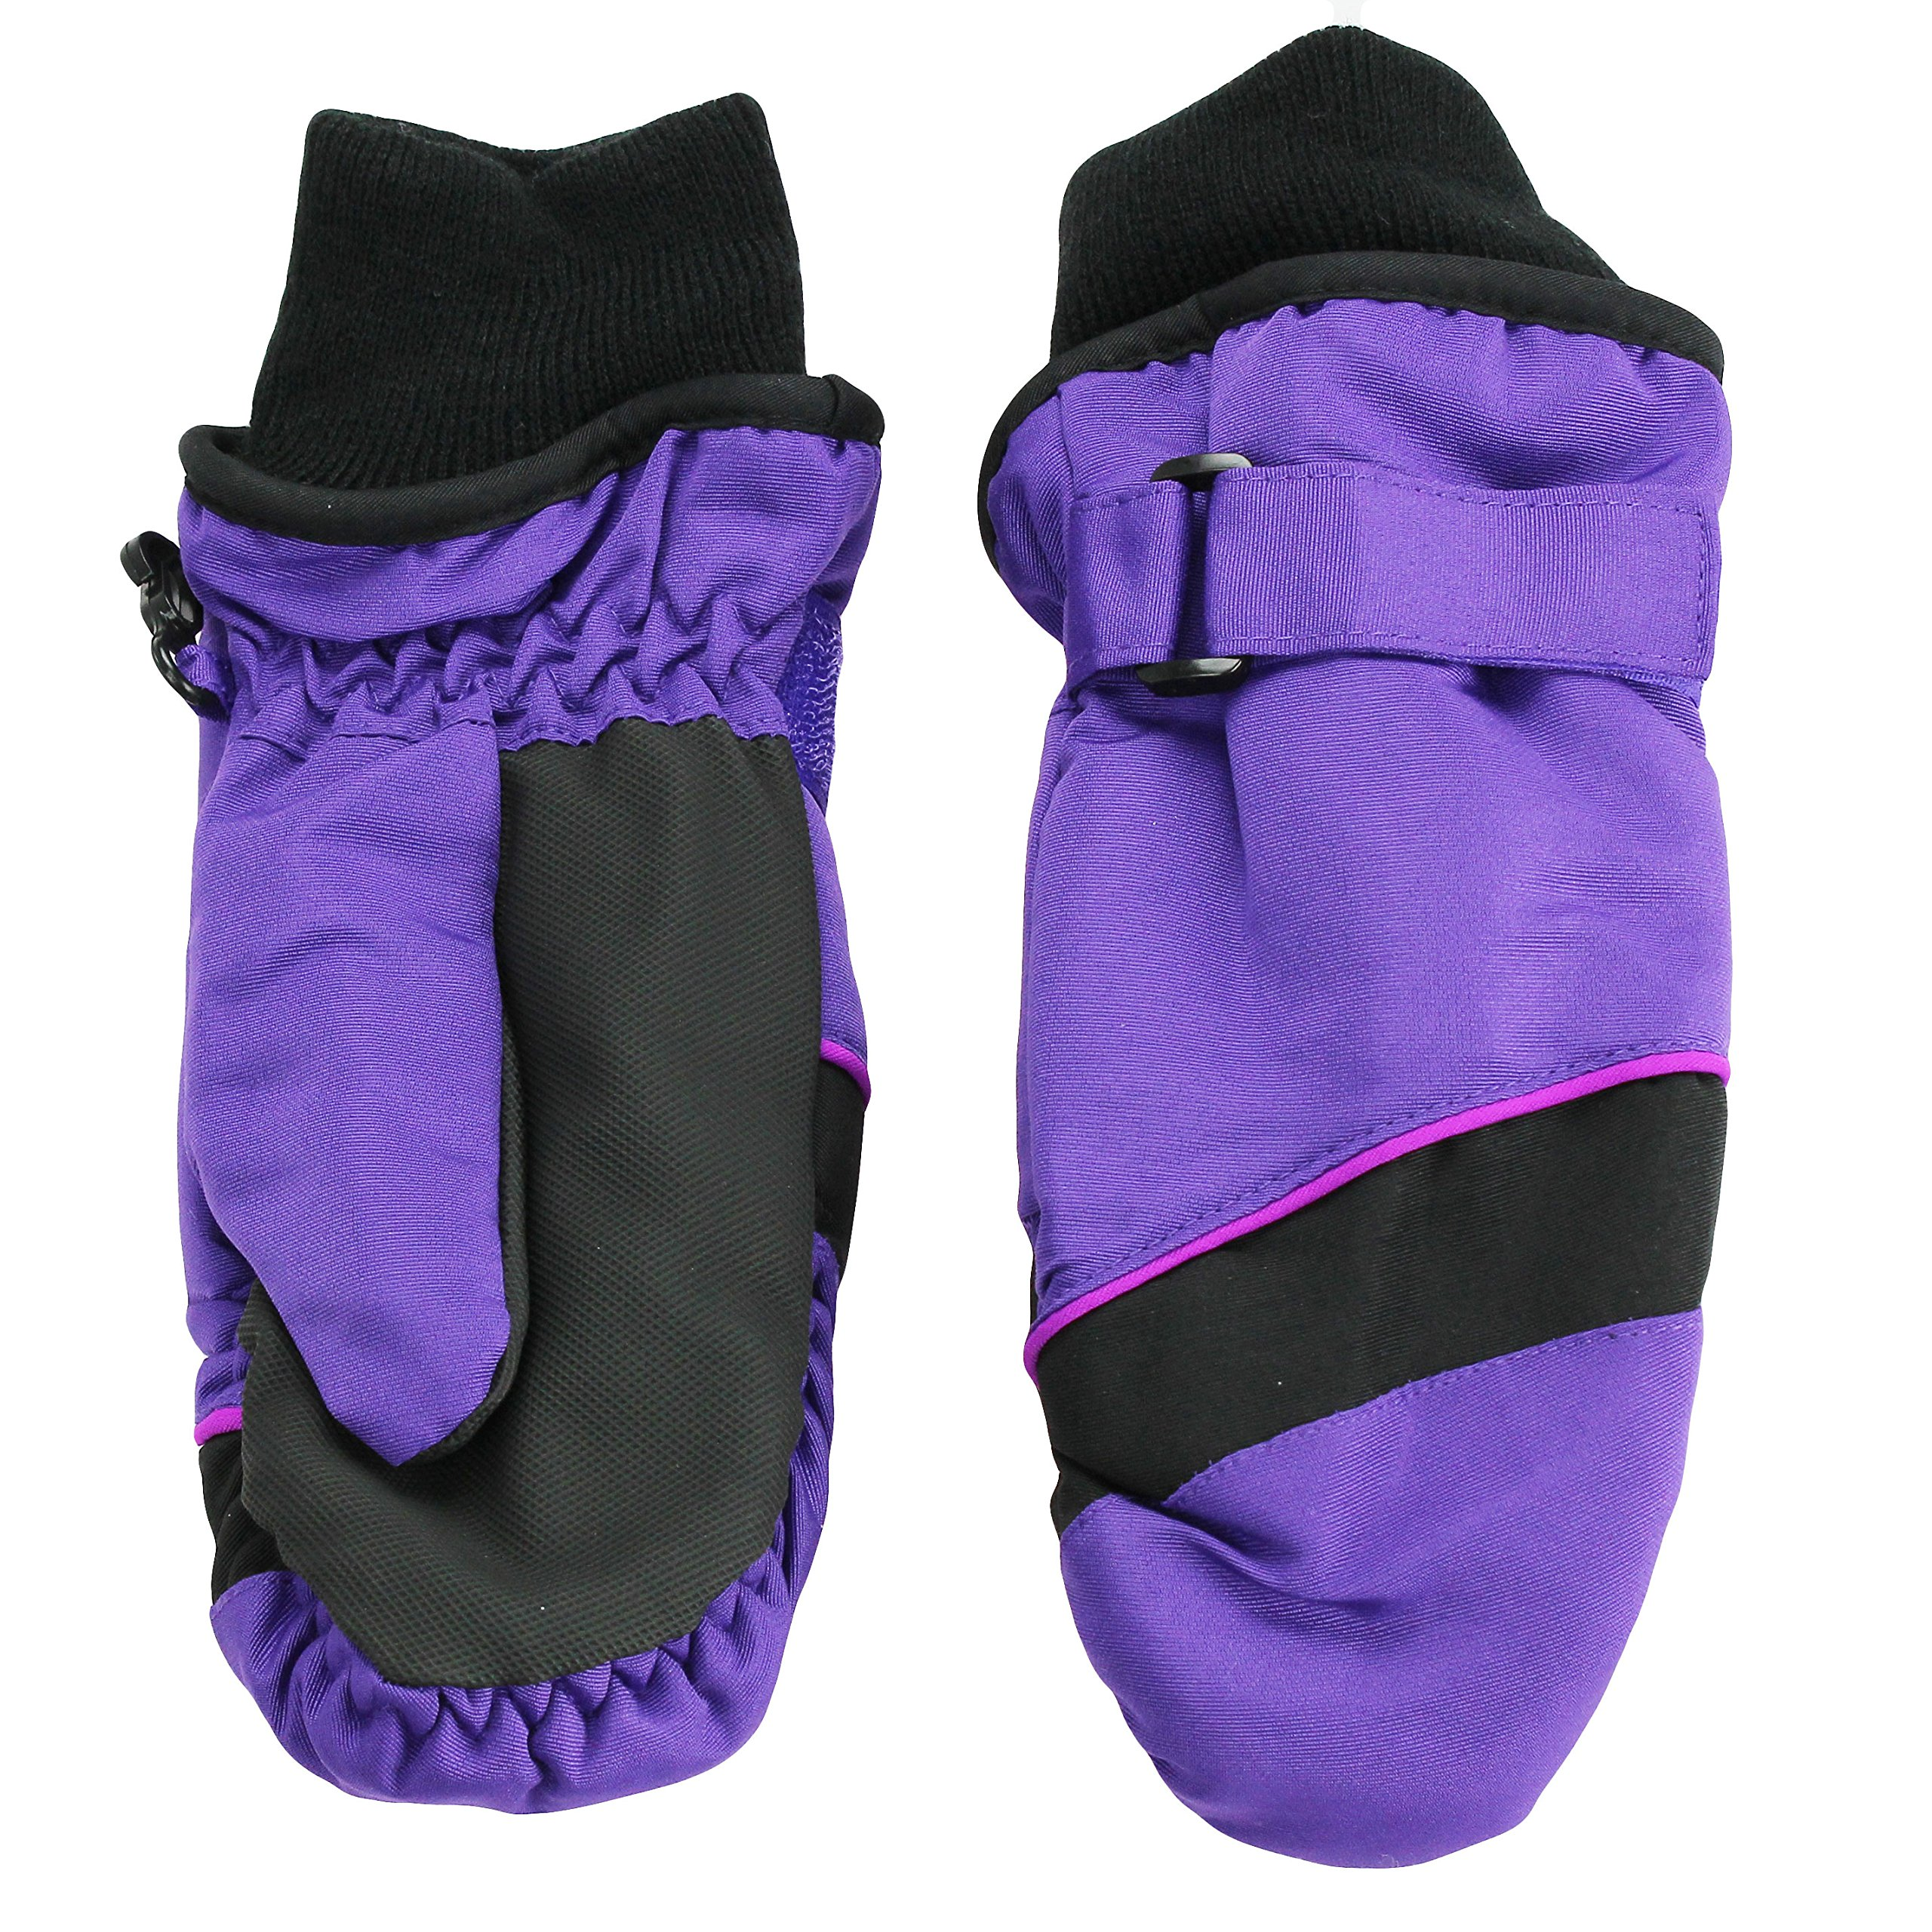 Nolan Girls Thinsulate Waterproof Colorblock Ski Mittens Black Purple Small/Med